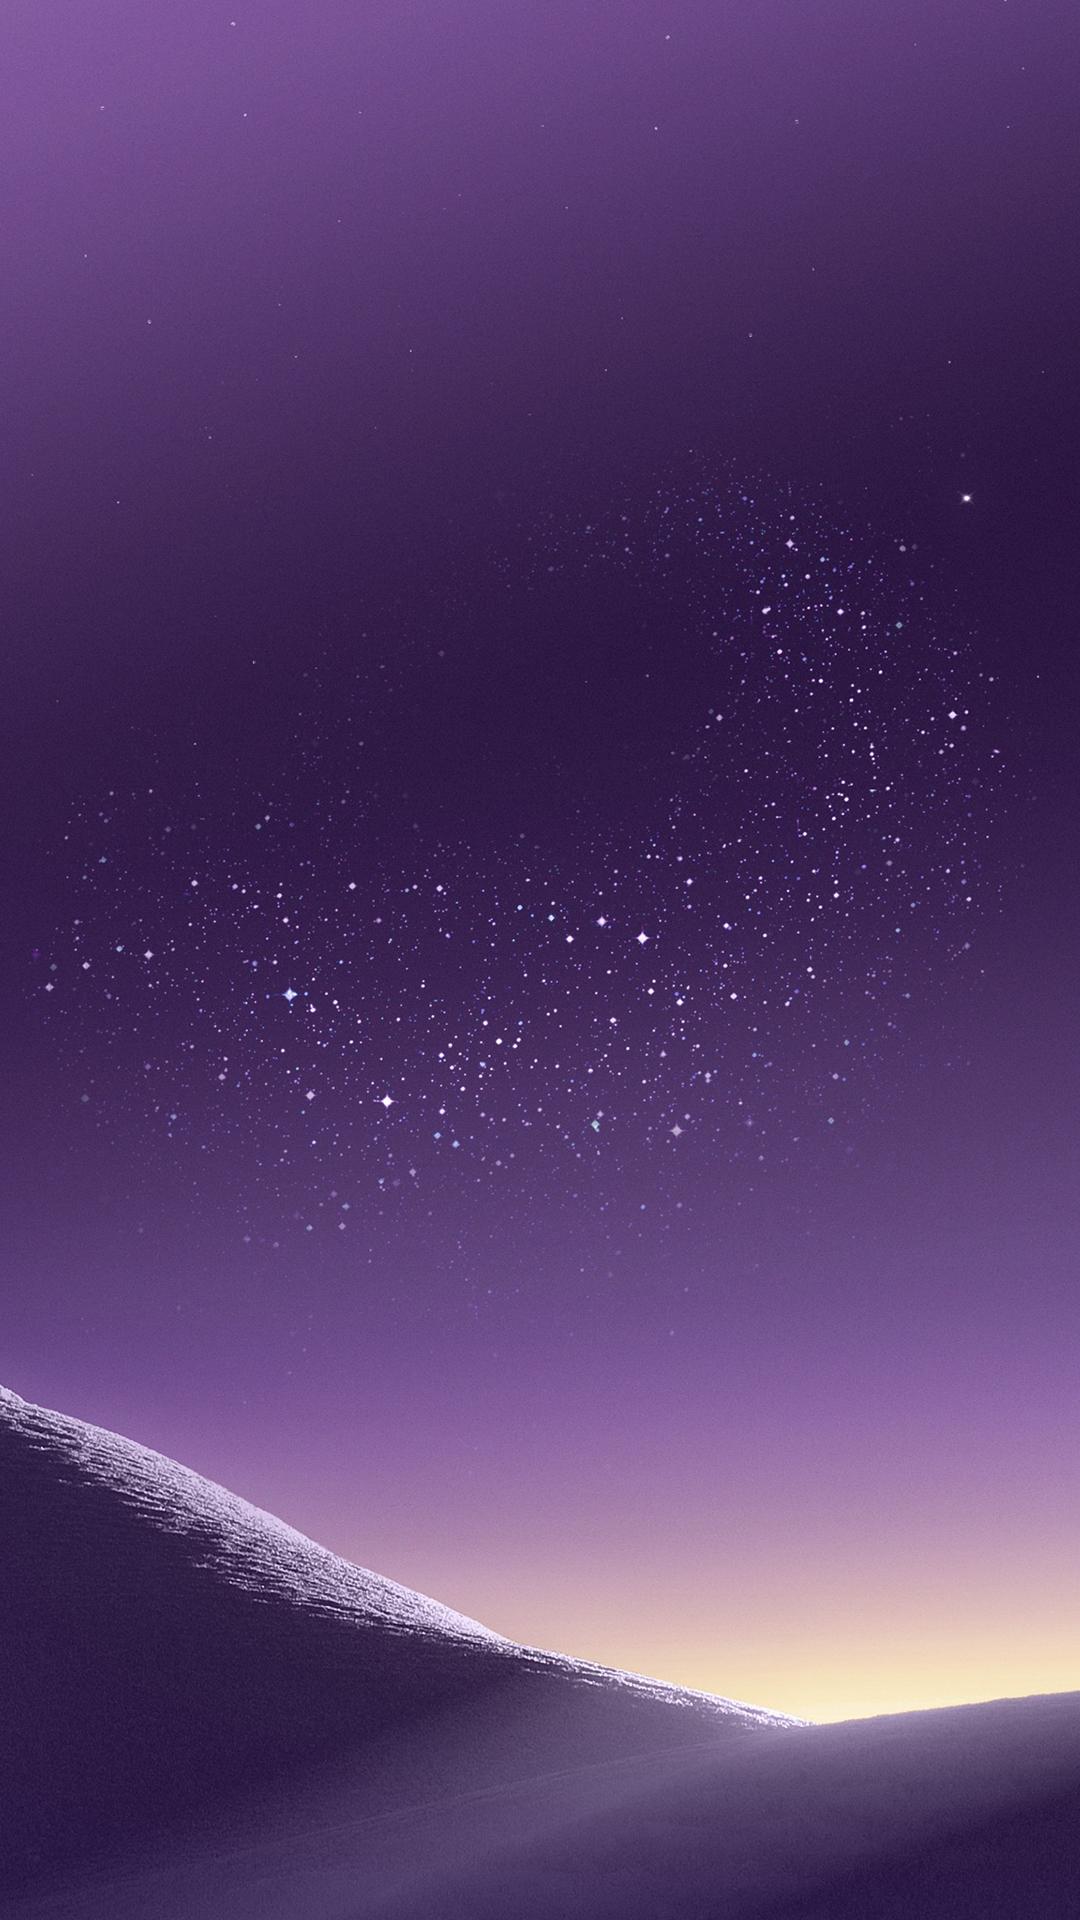 Slope Force Galaxy Blue Pink Purple Violet Background 1080x1920 Download Hd Wallpaper Wallpapertip